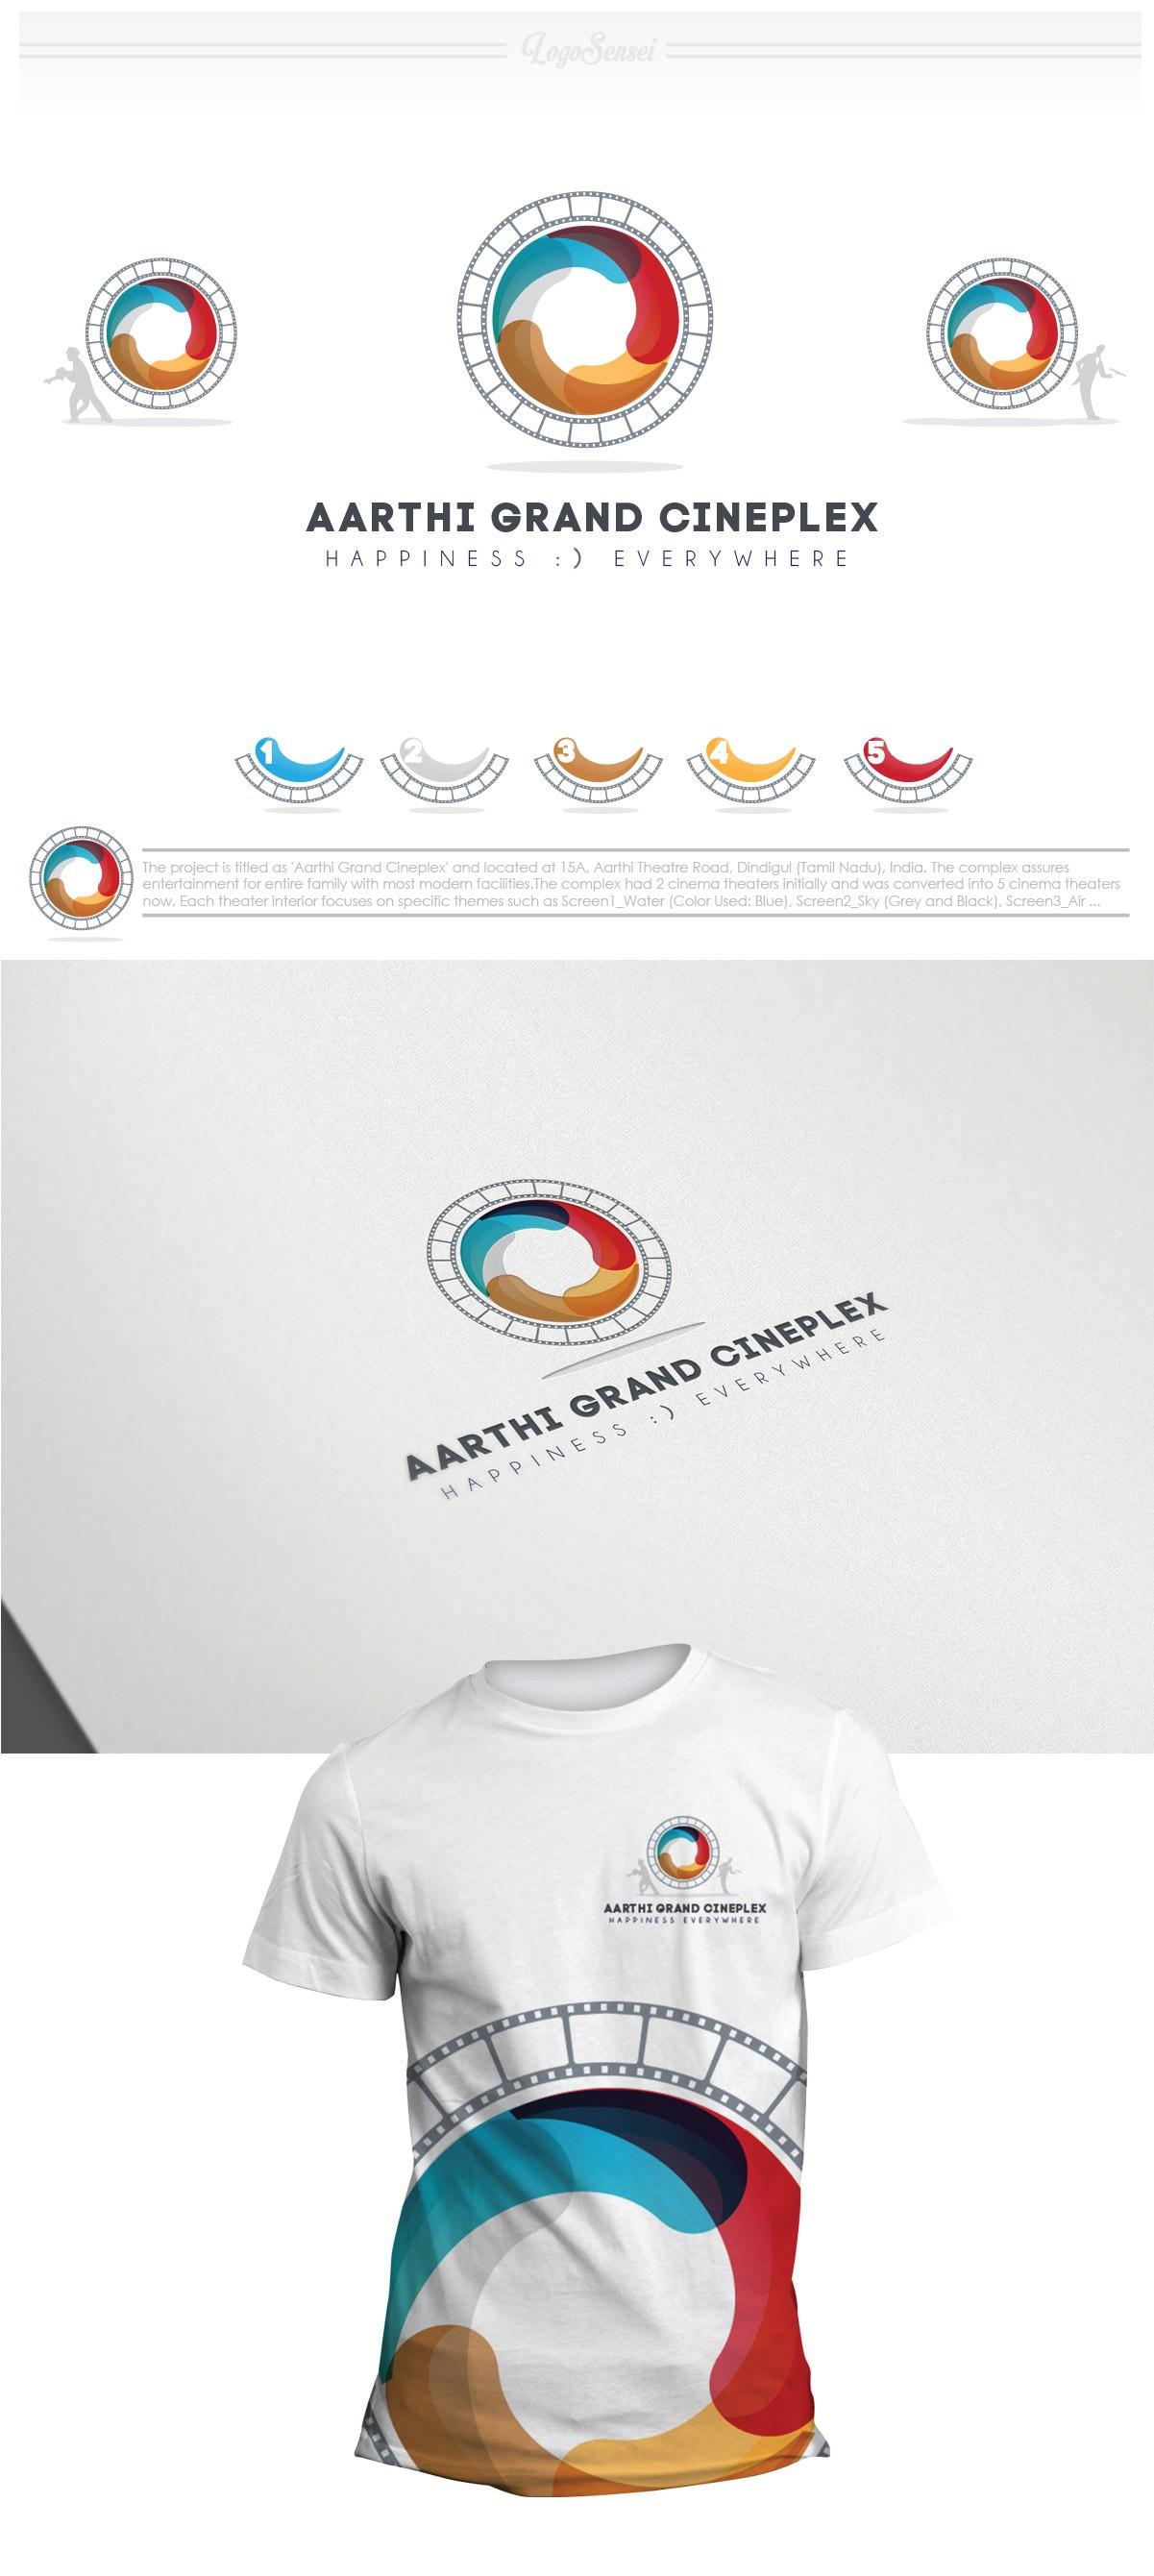 Aarthi Grand Cineplex needs a new logo